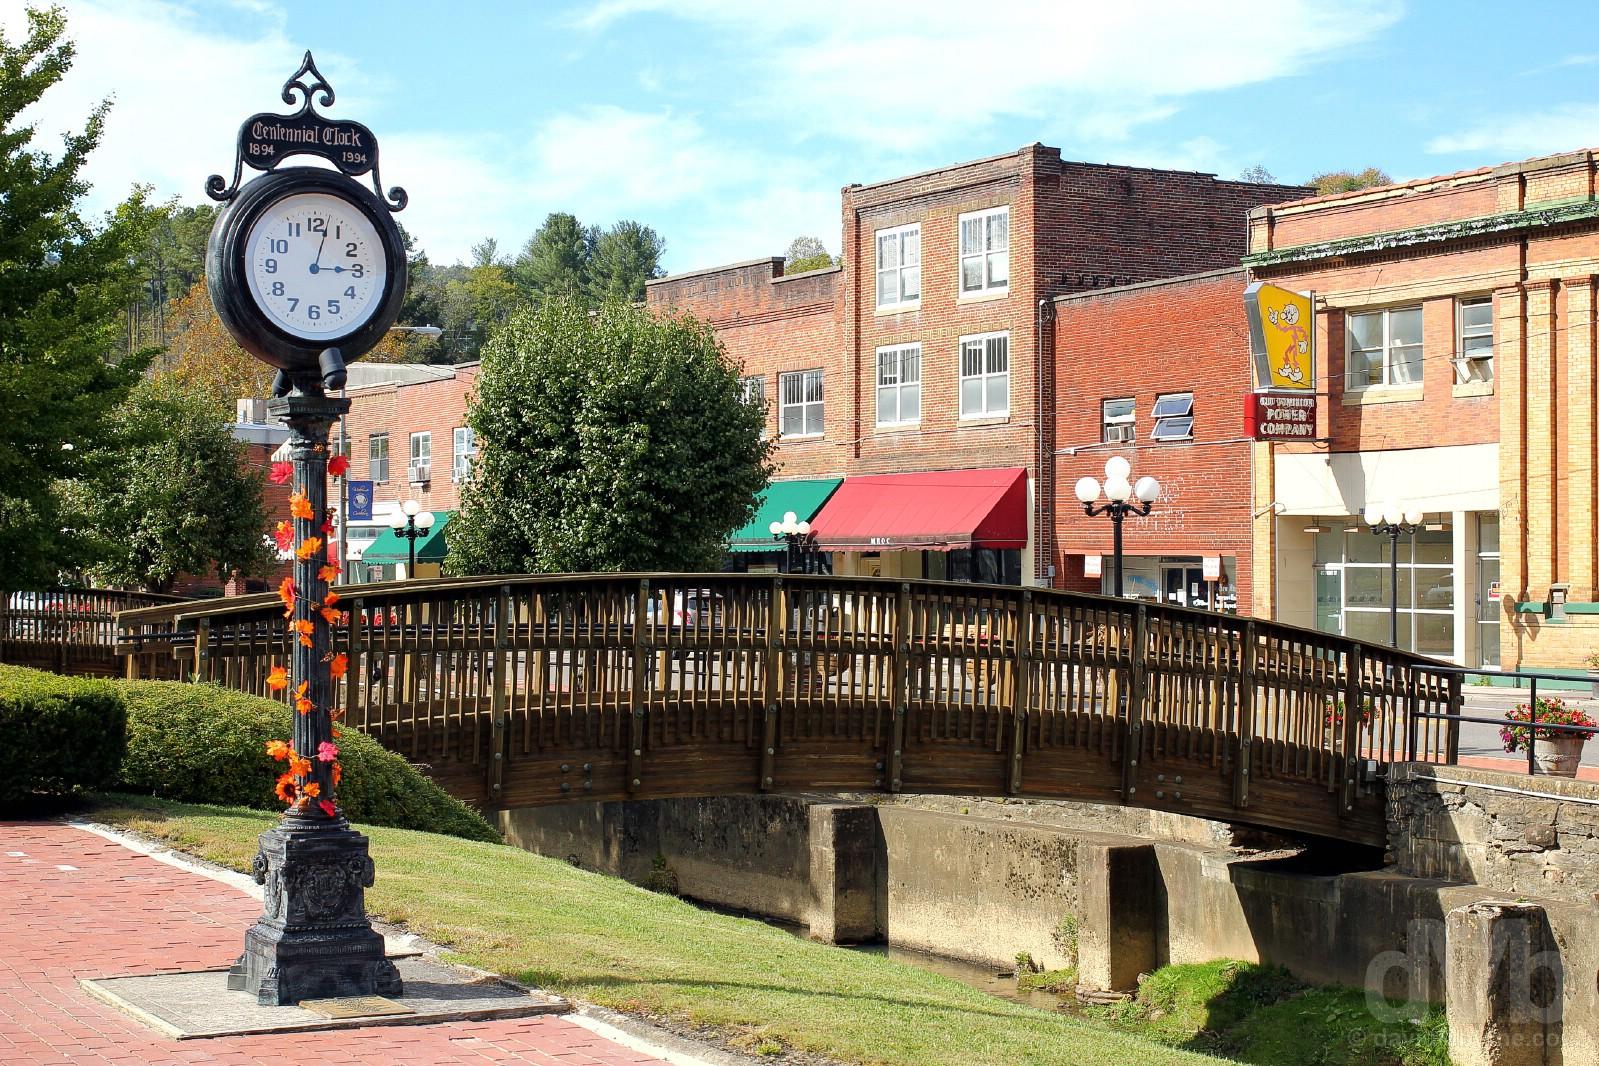 Coeburn, Virginia. October 18, 2017.